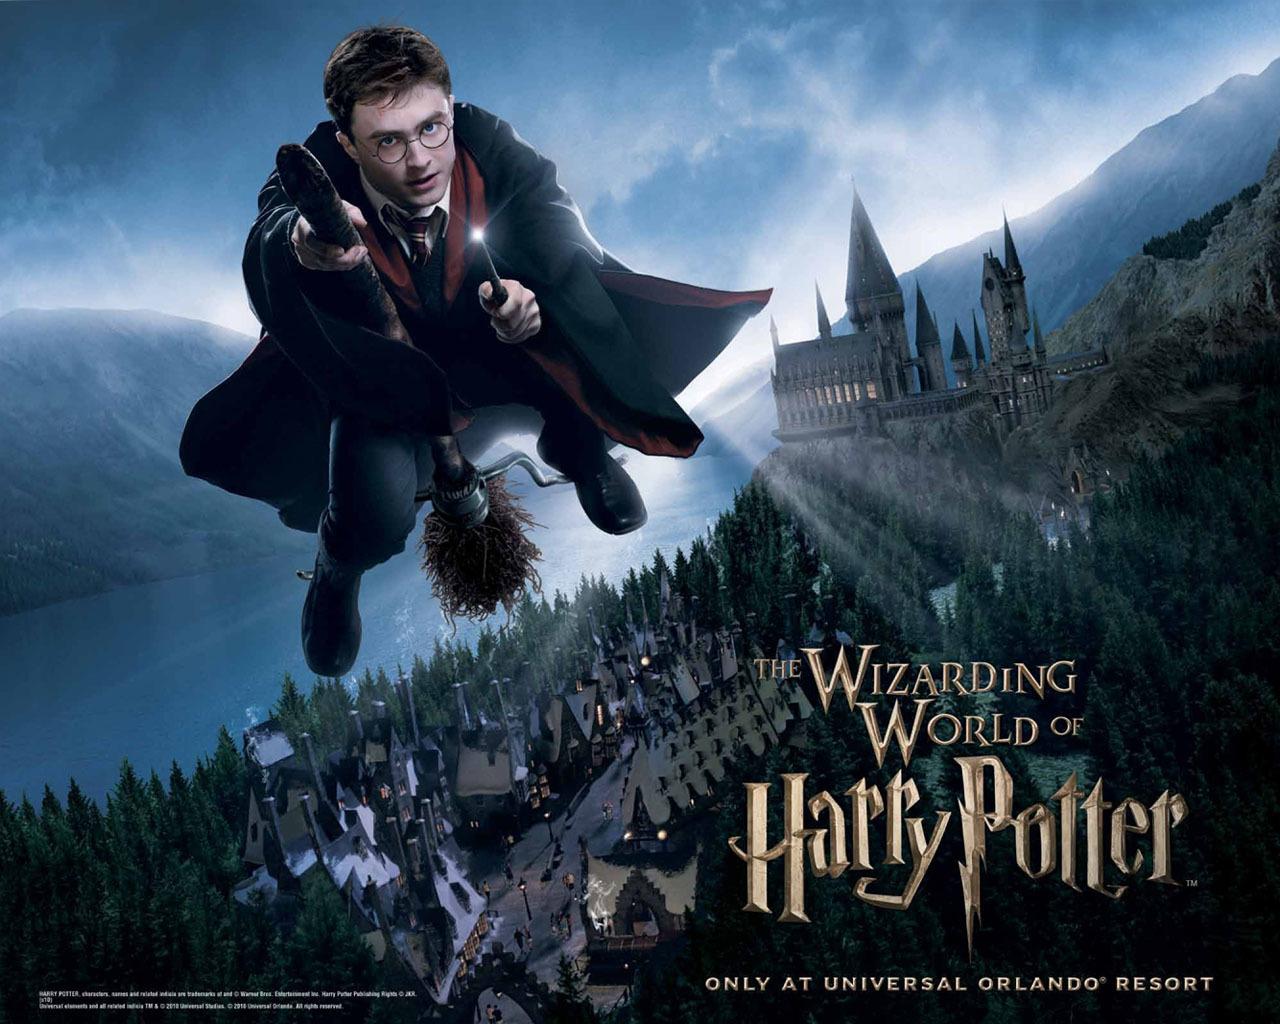 Wizarding World Wallpaper   Harry Potter Wallpaper 10393334 1280x1024